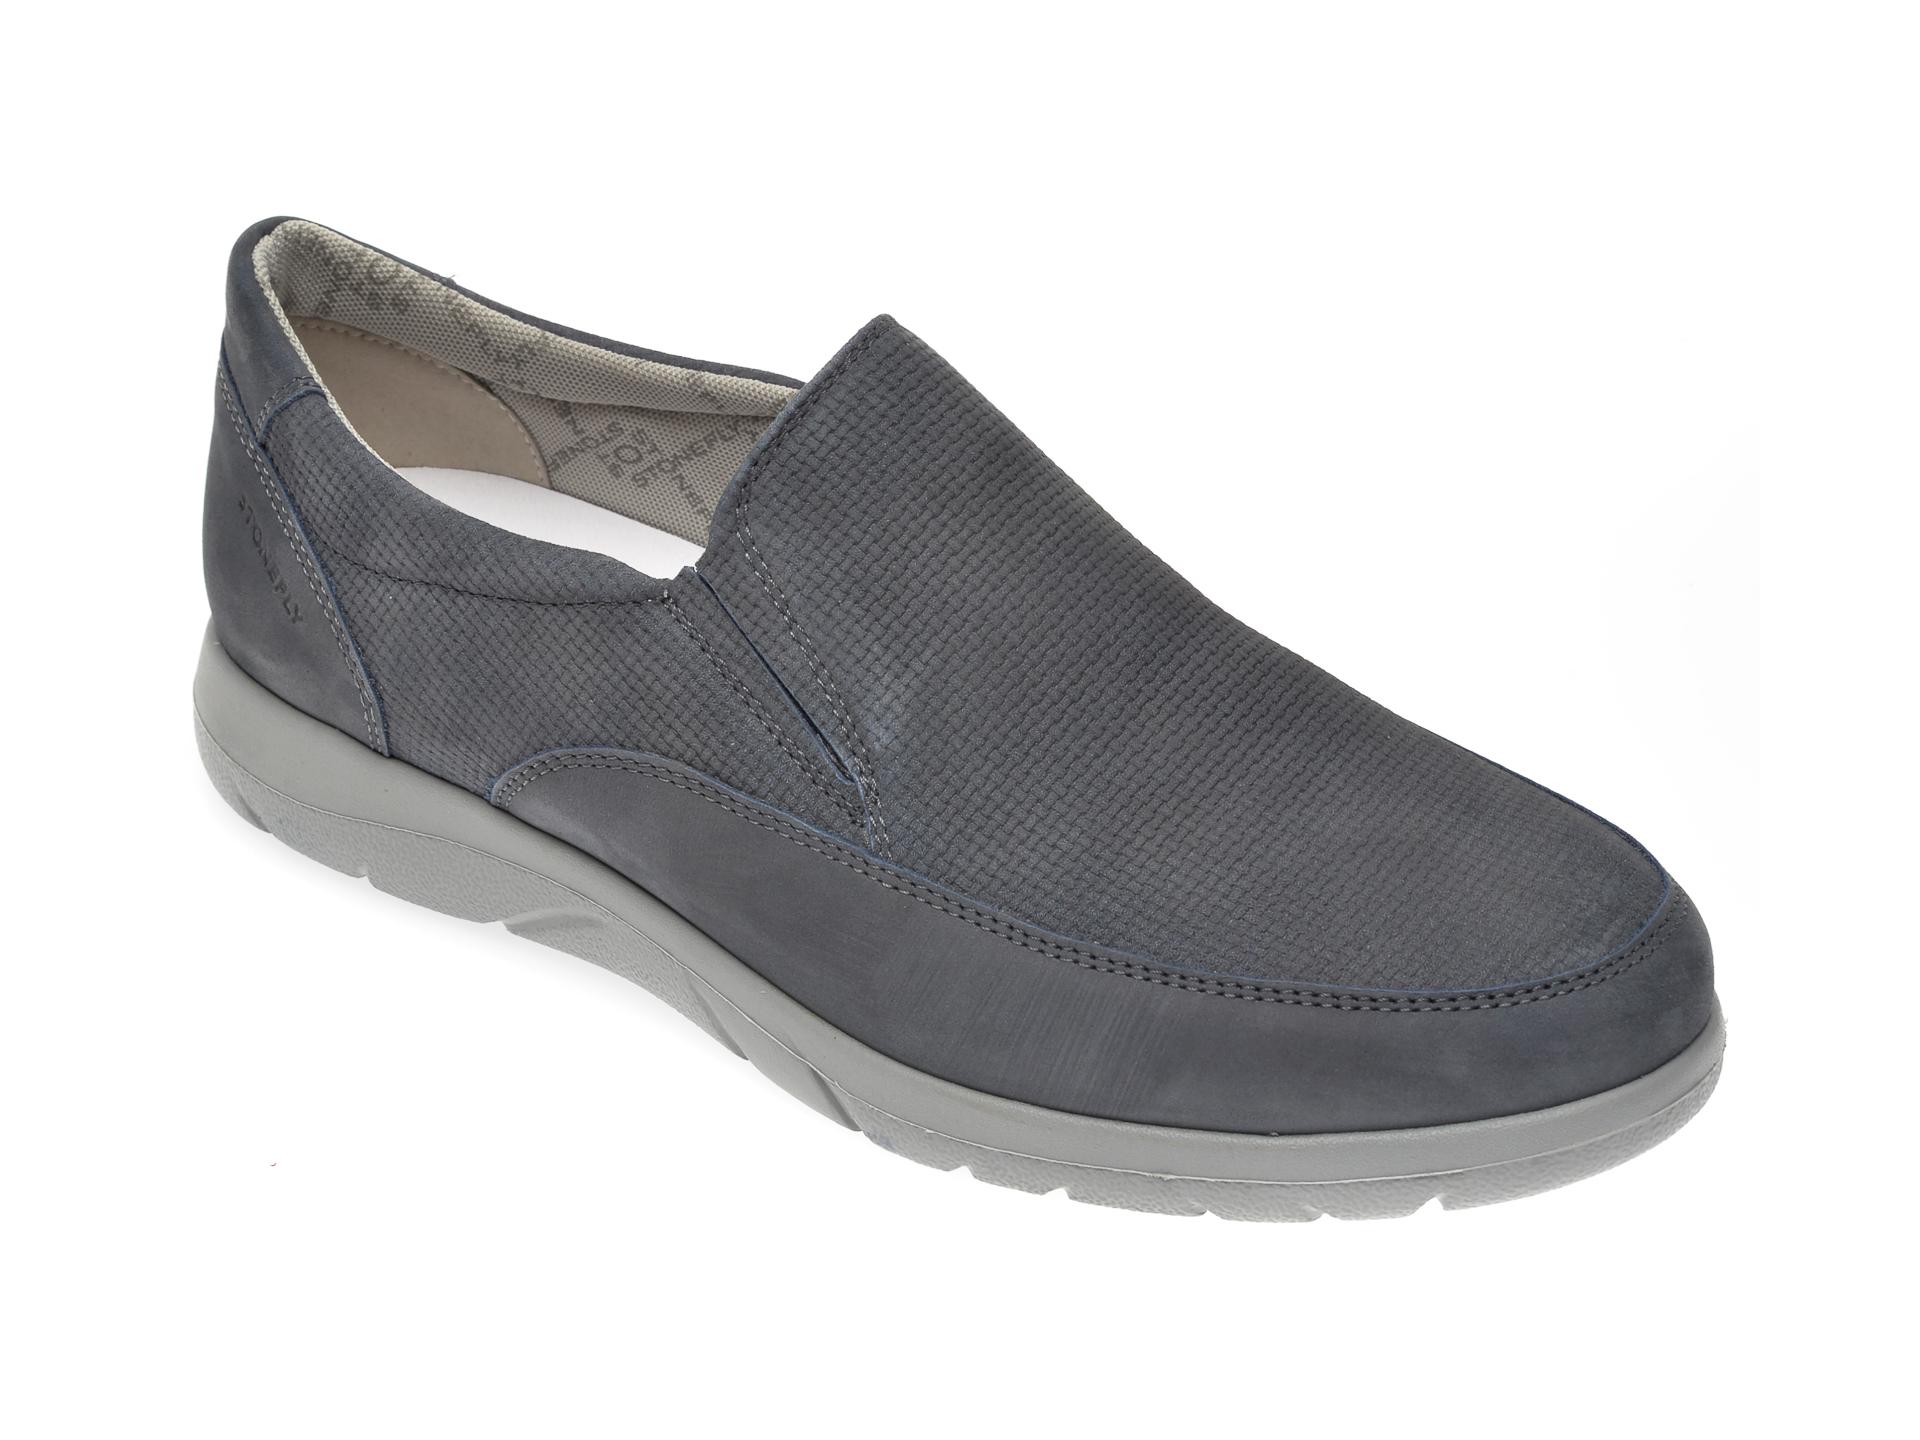 Pantofi STONEFLY bleumarin, SPAMA26, din nabuc New